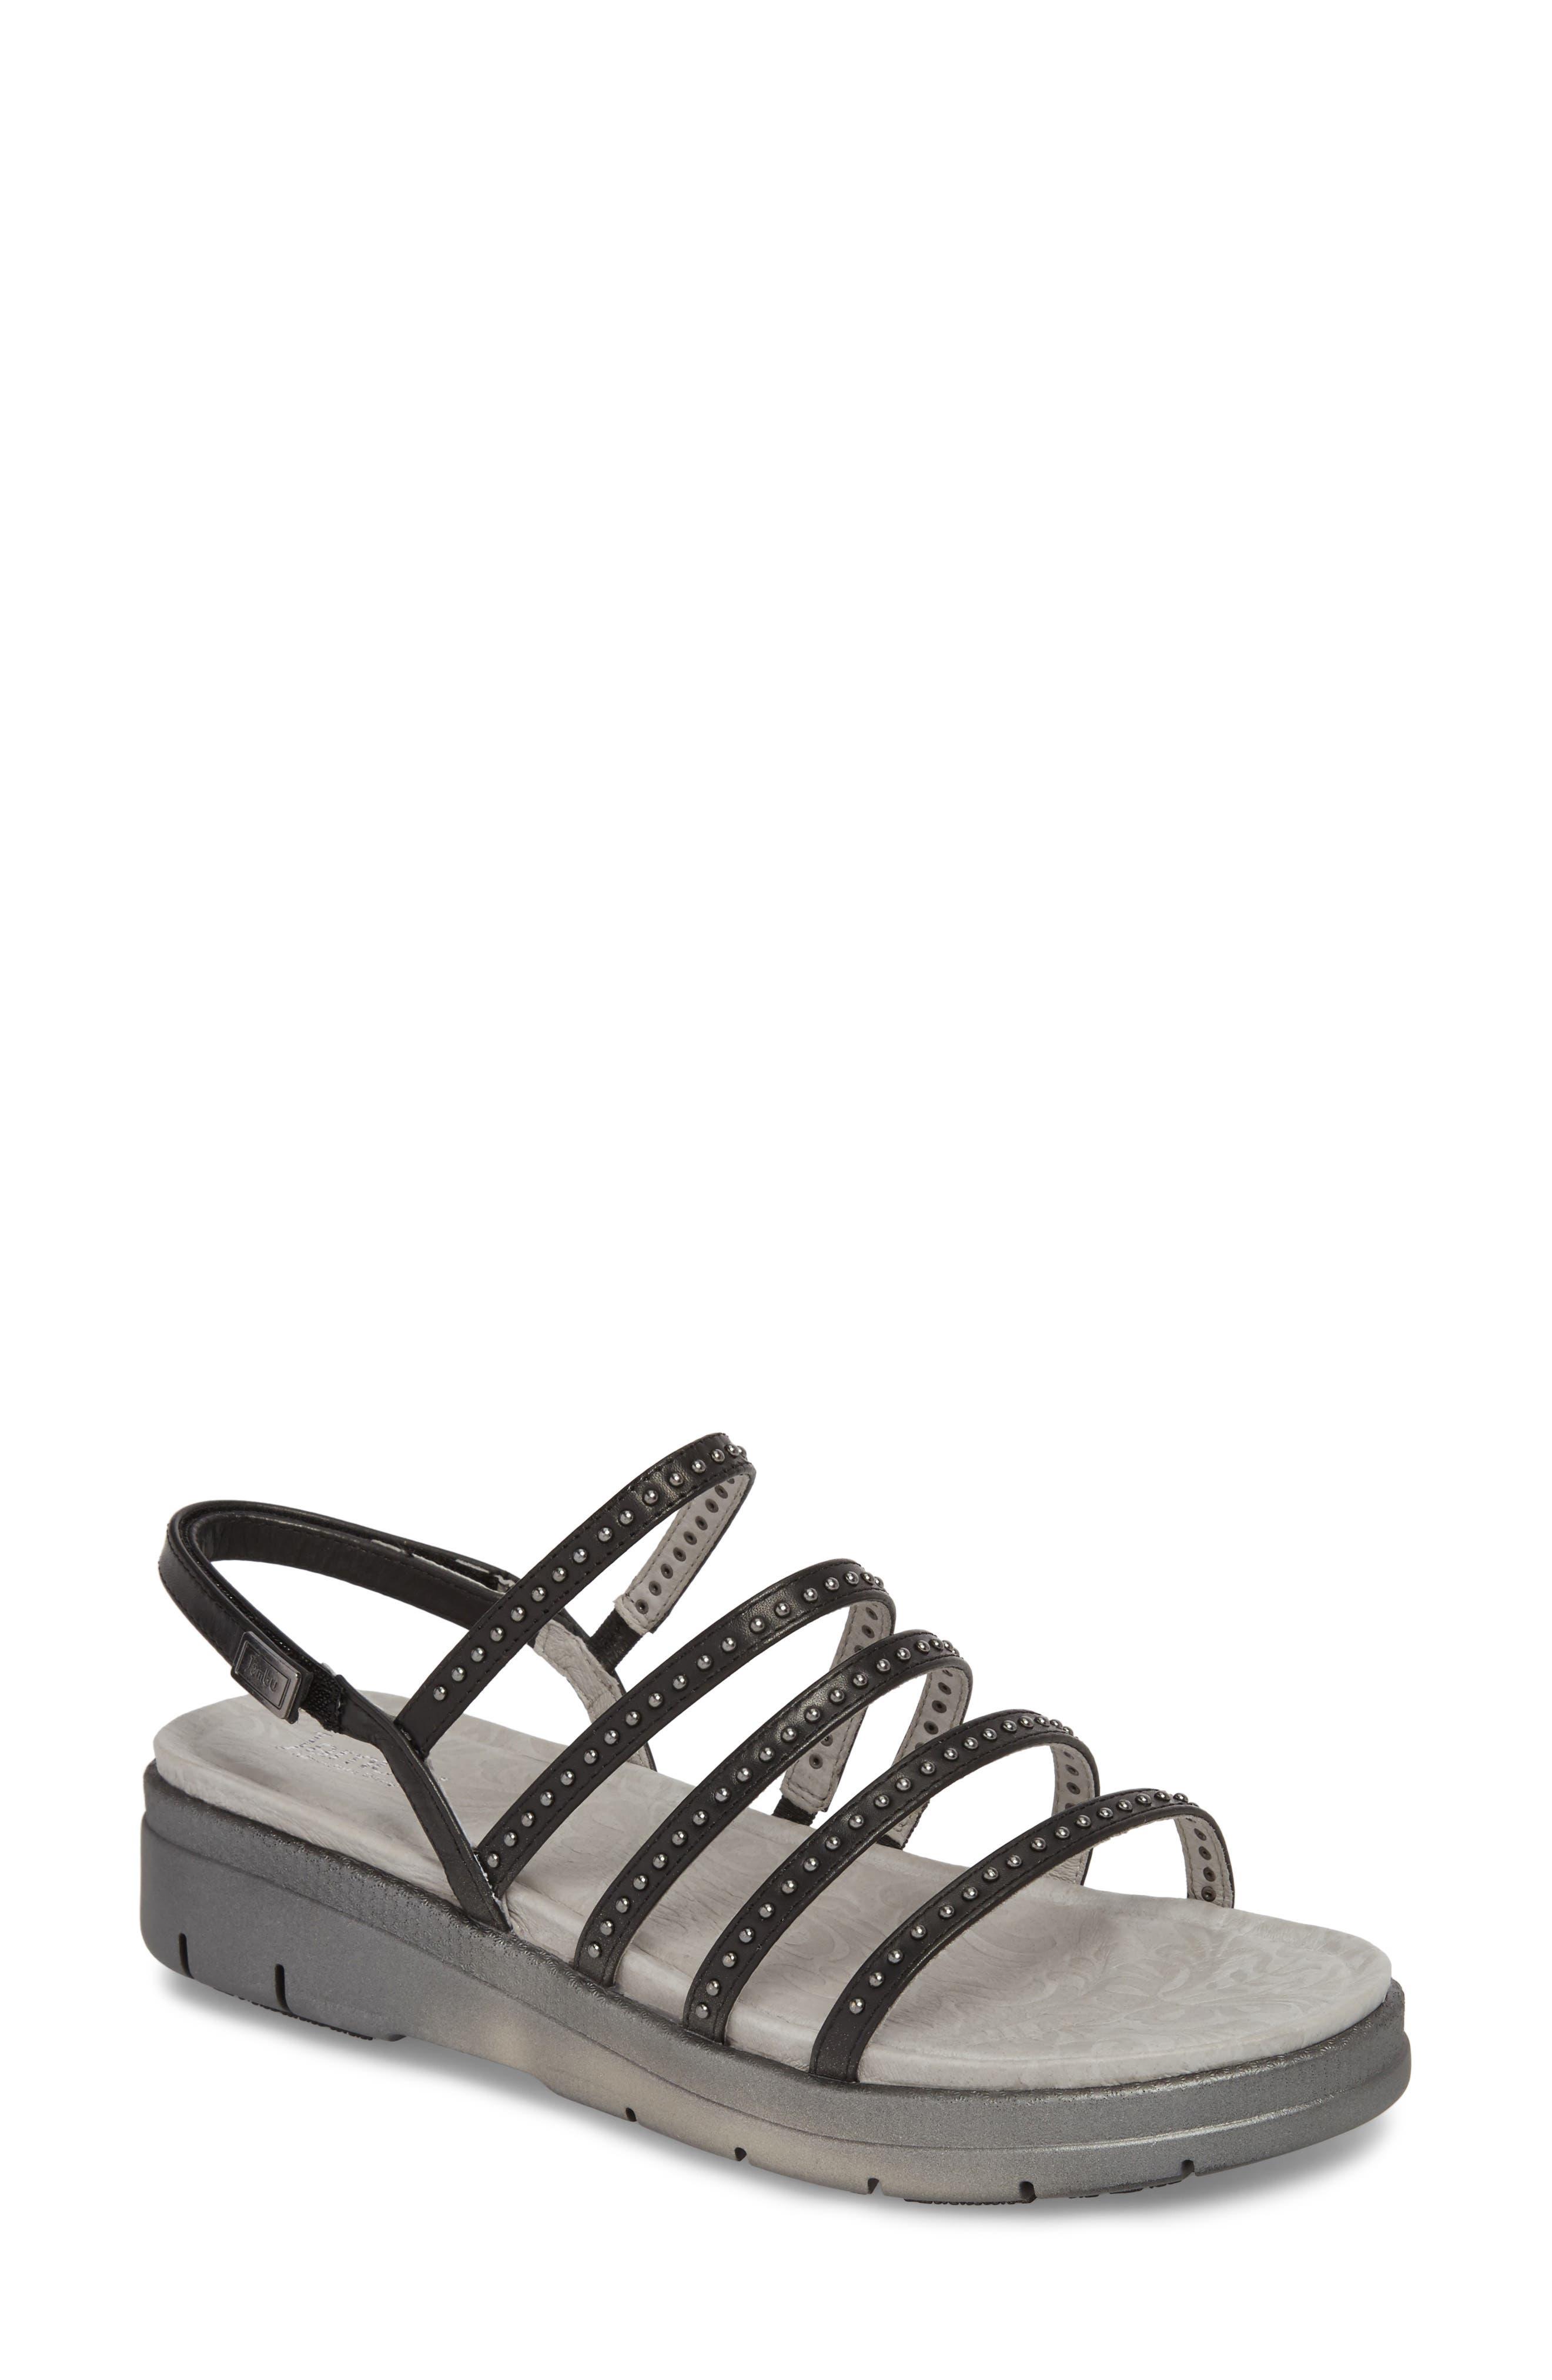 Elegance Studded Strappy Sandal,                             Main thumbnail 1, color,                             BLACK LEATHER